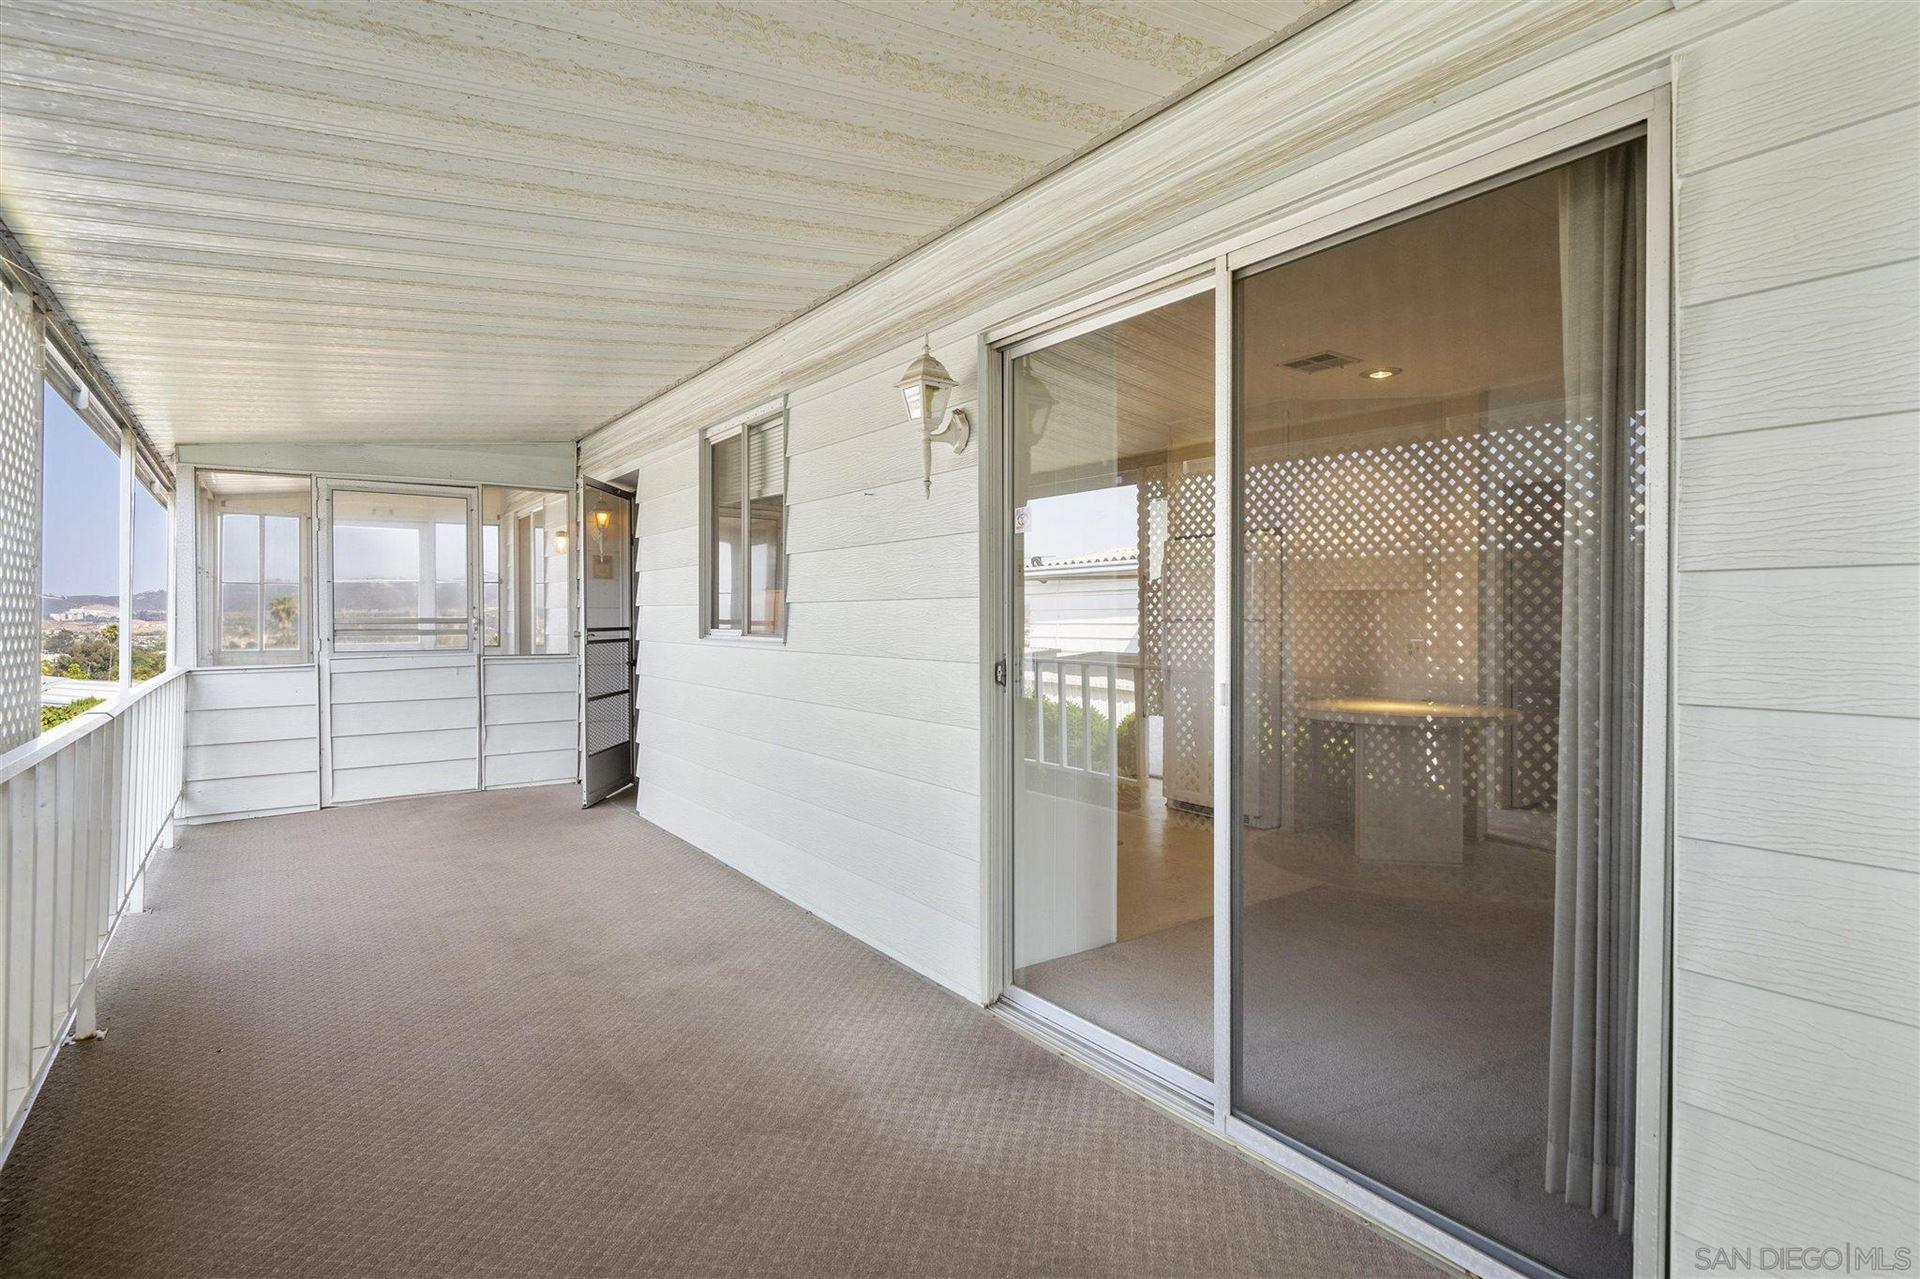 Photo of 3535 Linda Vista #178, San Marcos, CA 92078 (MLS # 210020969)